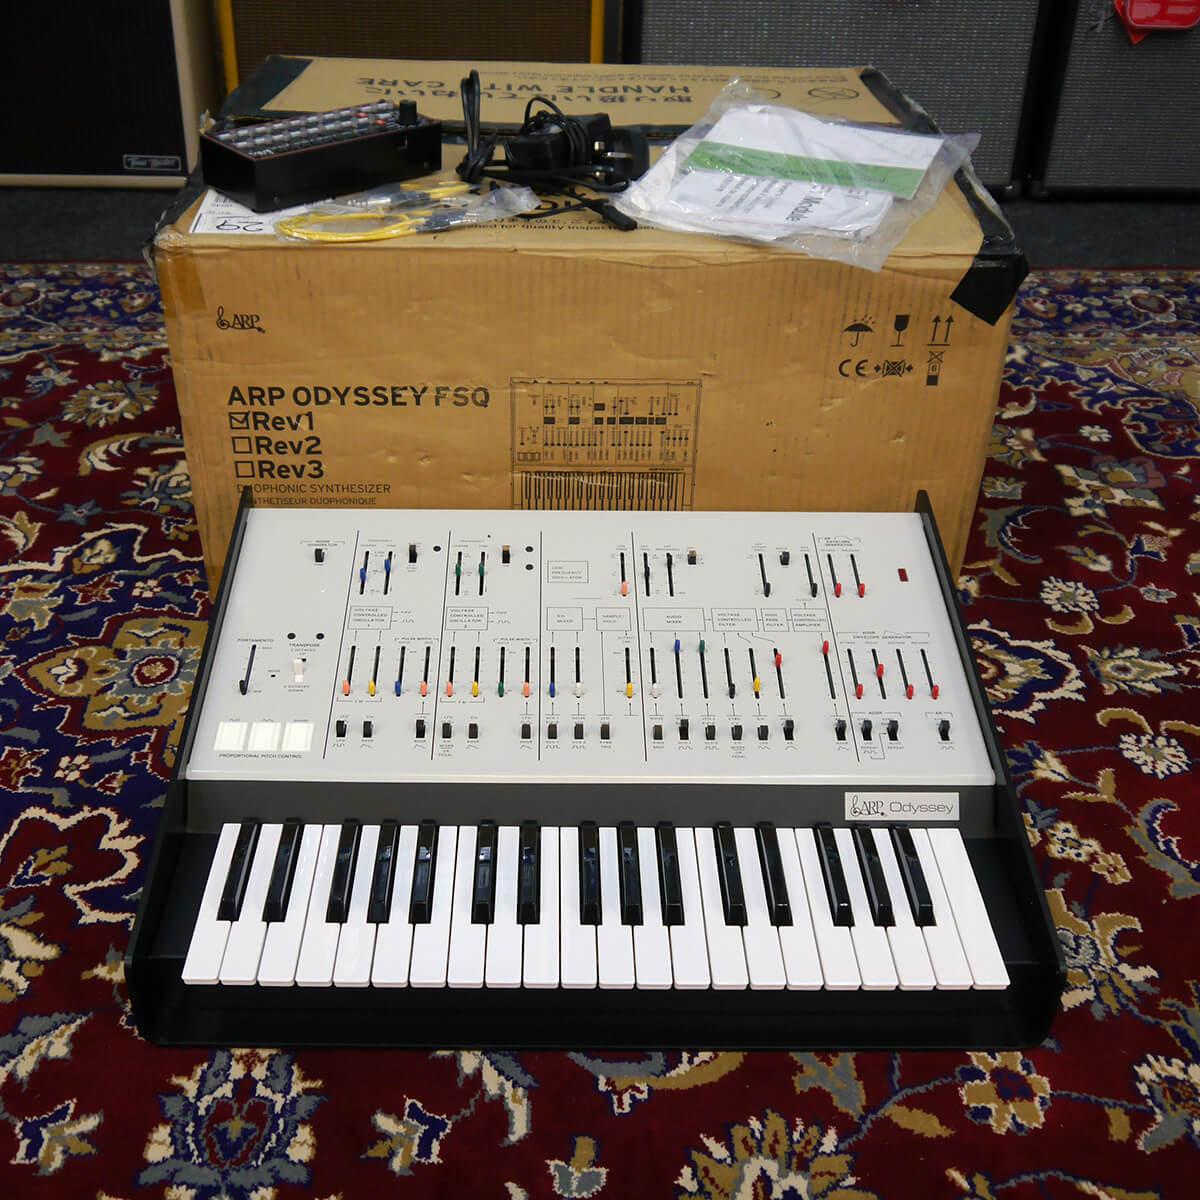 Arp Odyssey Rev 1 White & SQ1 Sequencer w/Box & PSU - 2nd Hand